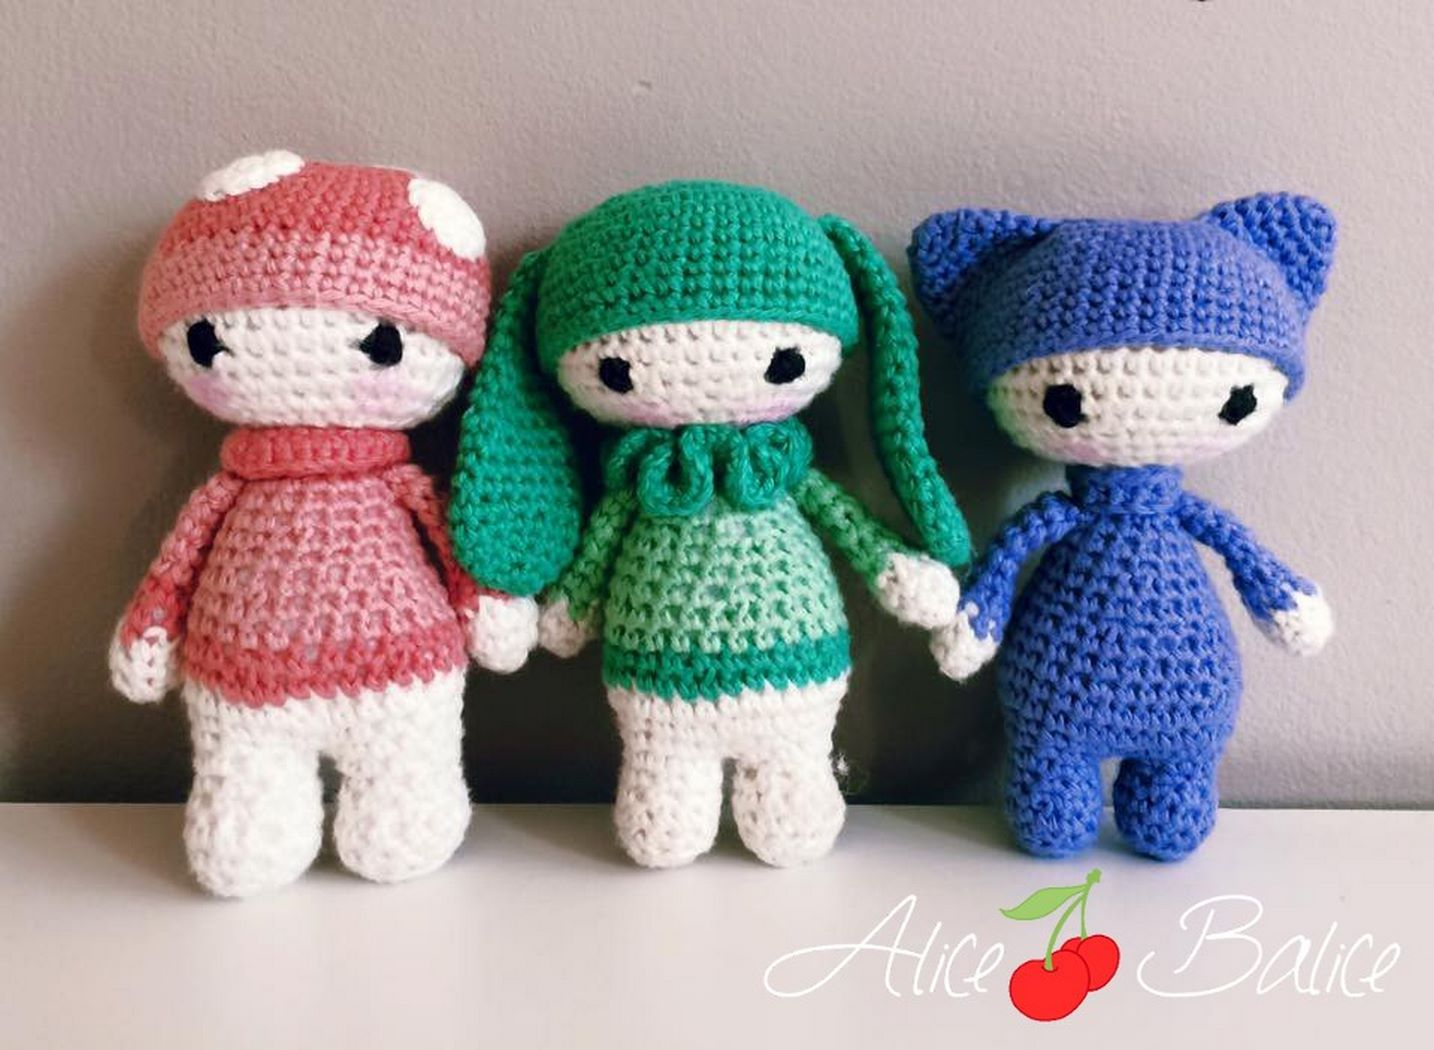 Amigurumi Patron Gratuit : Tuto crochet tiny lalylala mes petits amis amigurumi alice